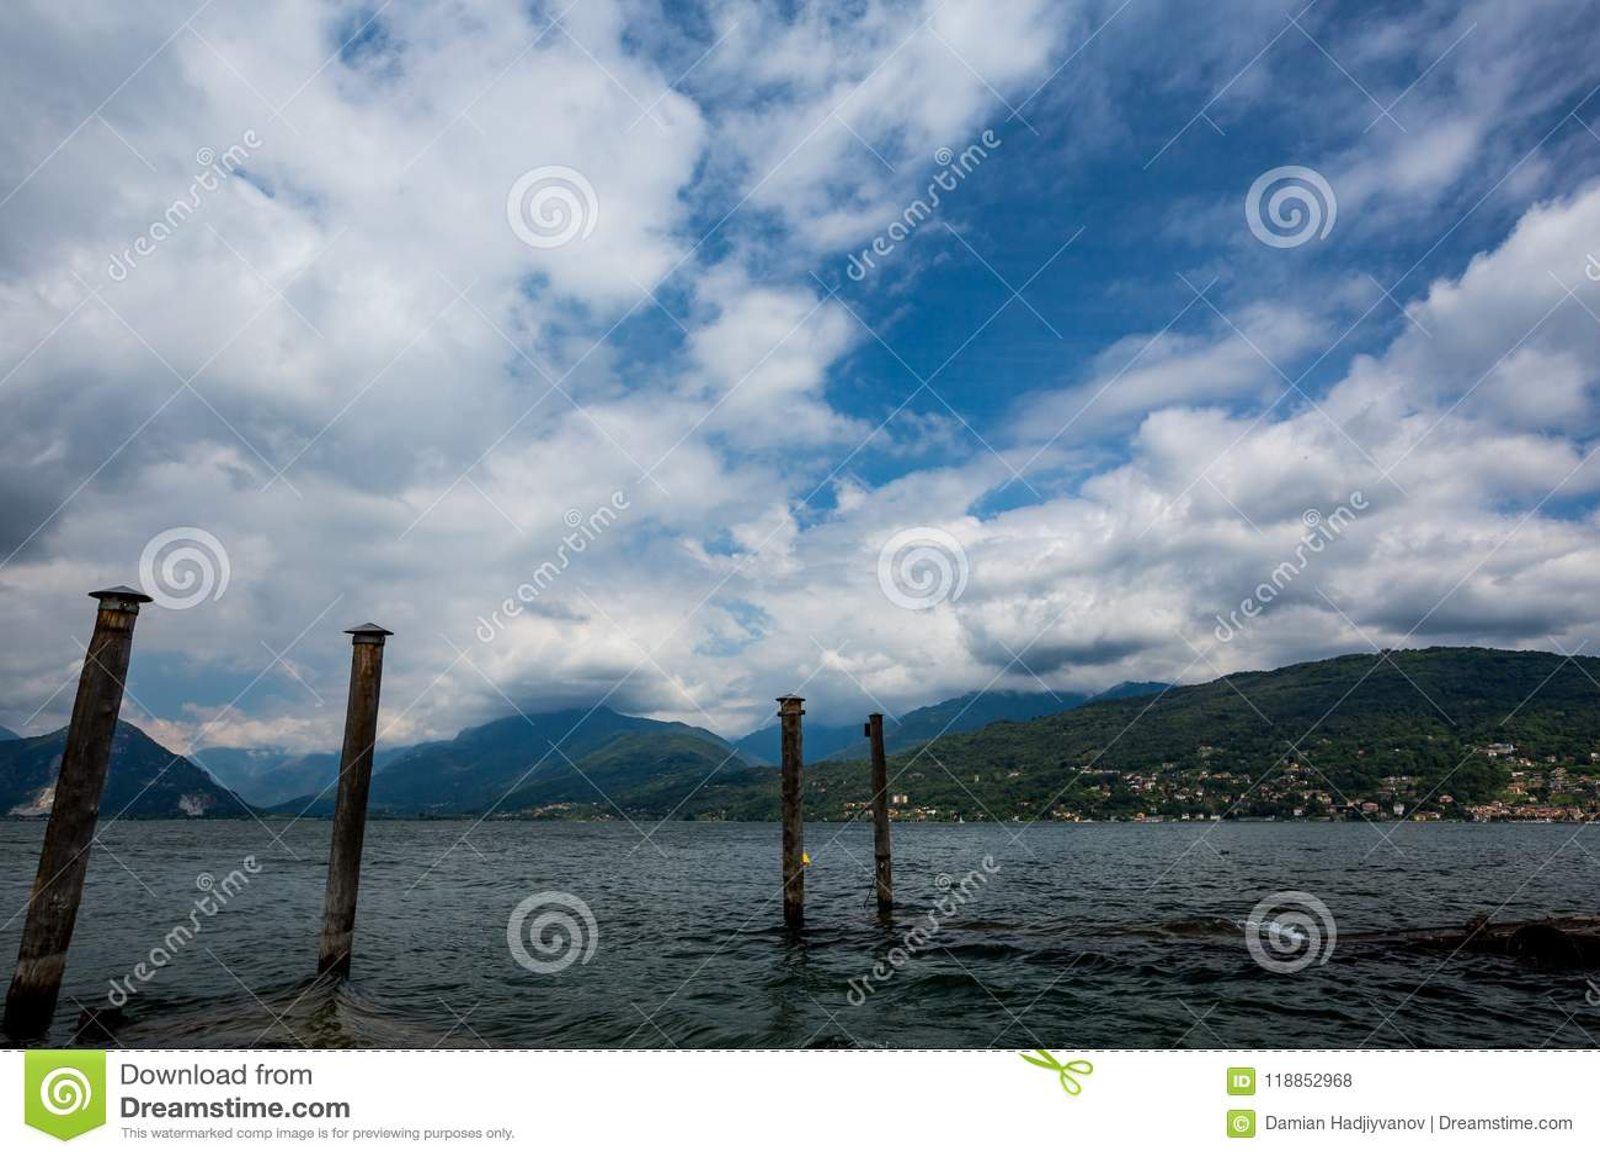 Pijlers, Stad Stresa op Italiaanse Lago Di Maggiore